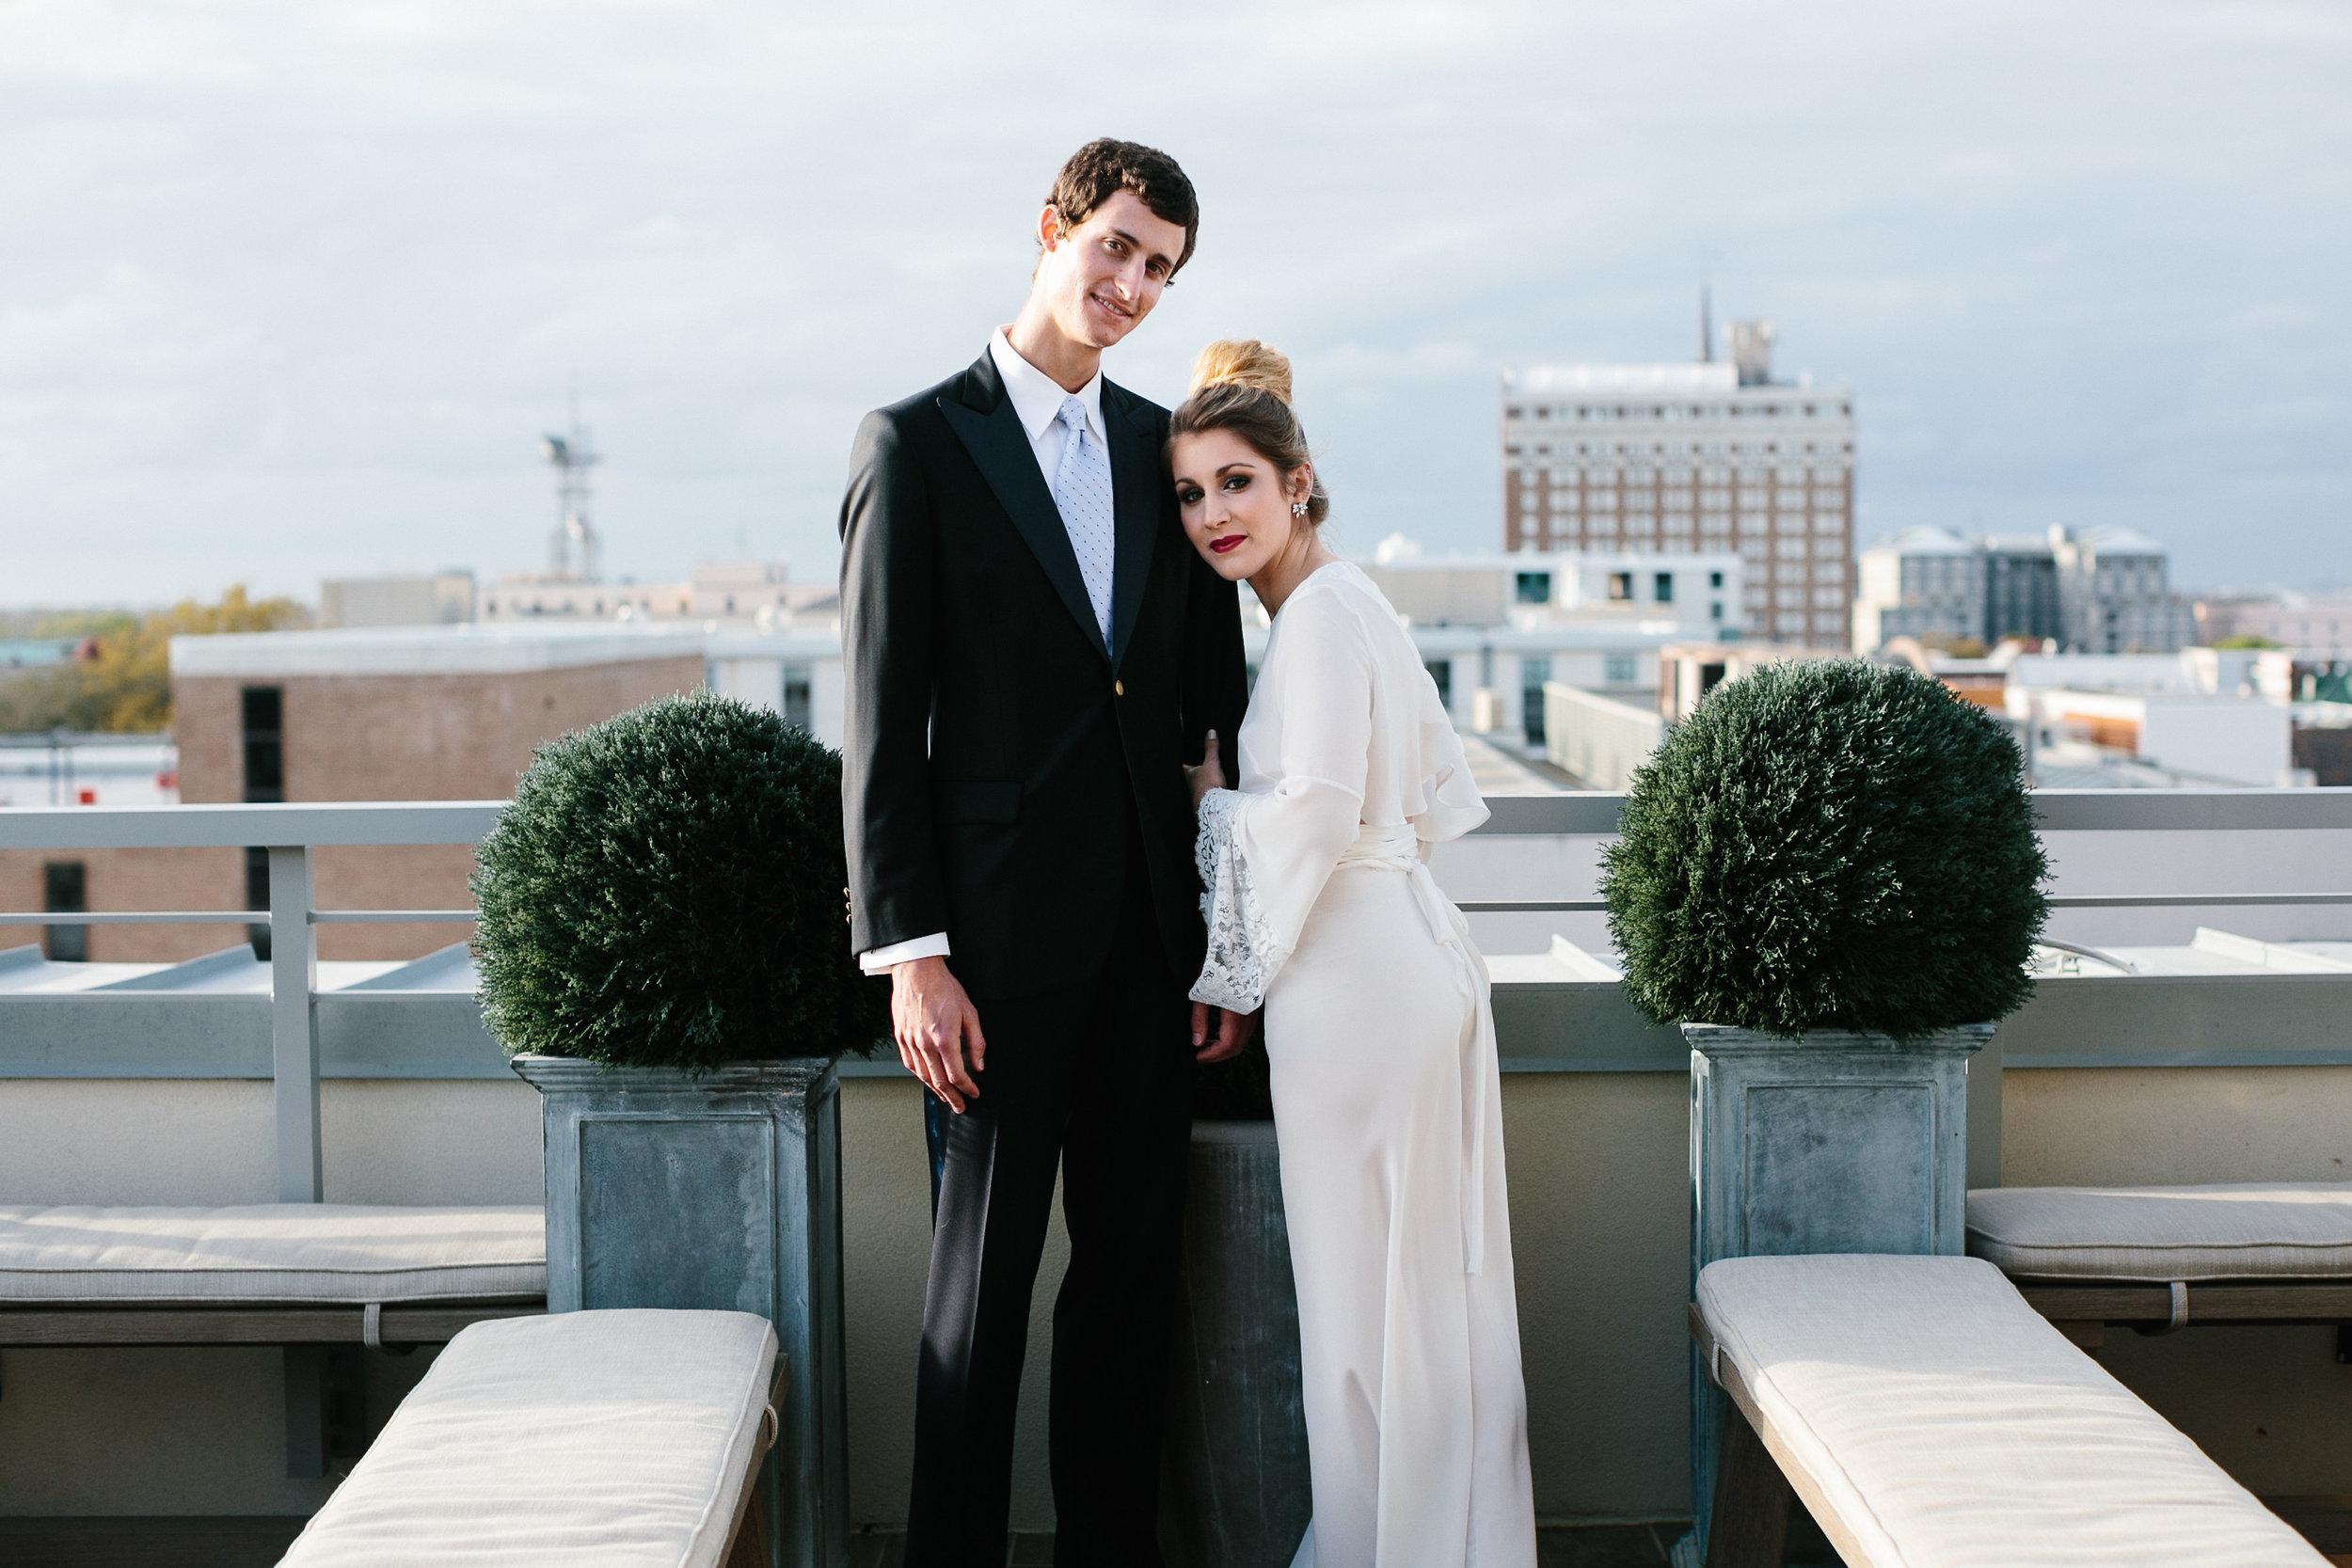 charleston-wedding-elopement-35.jpg